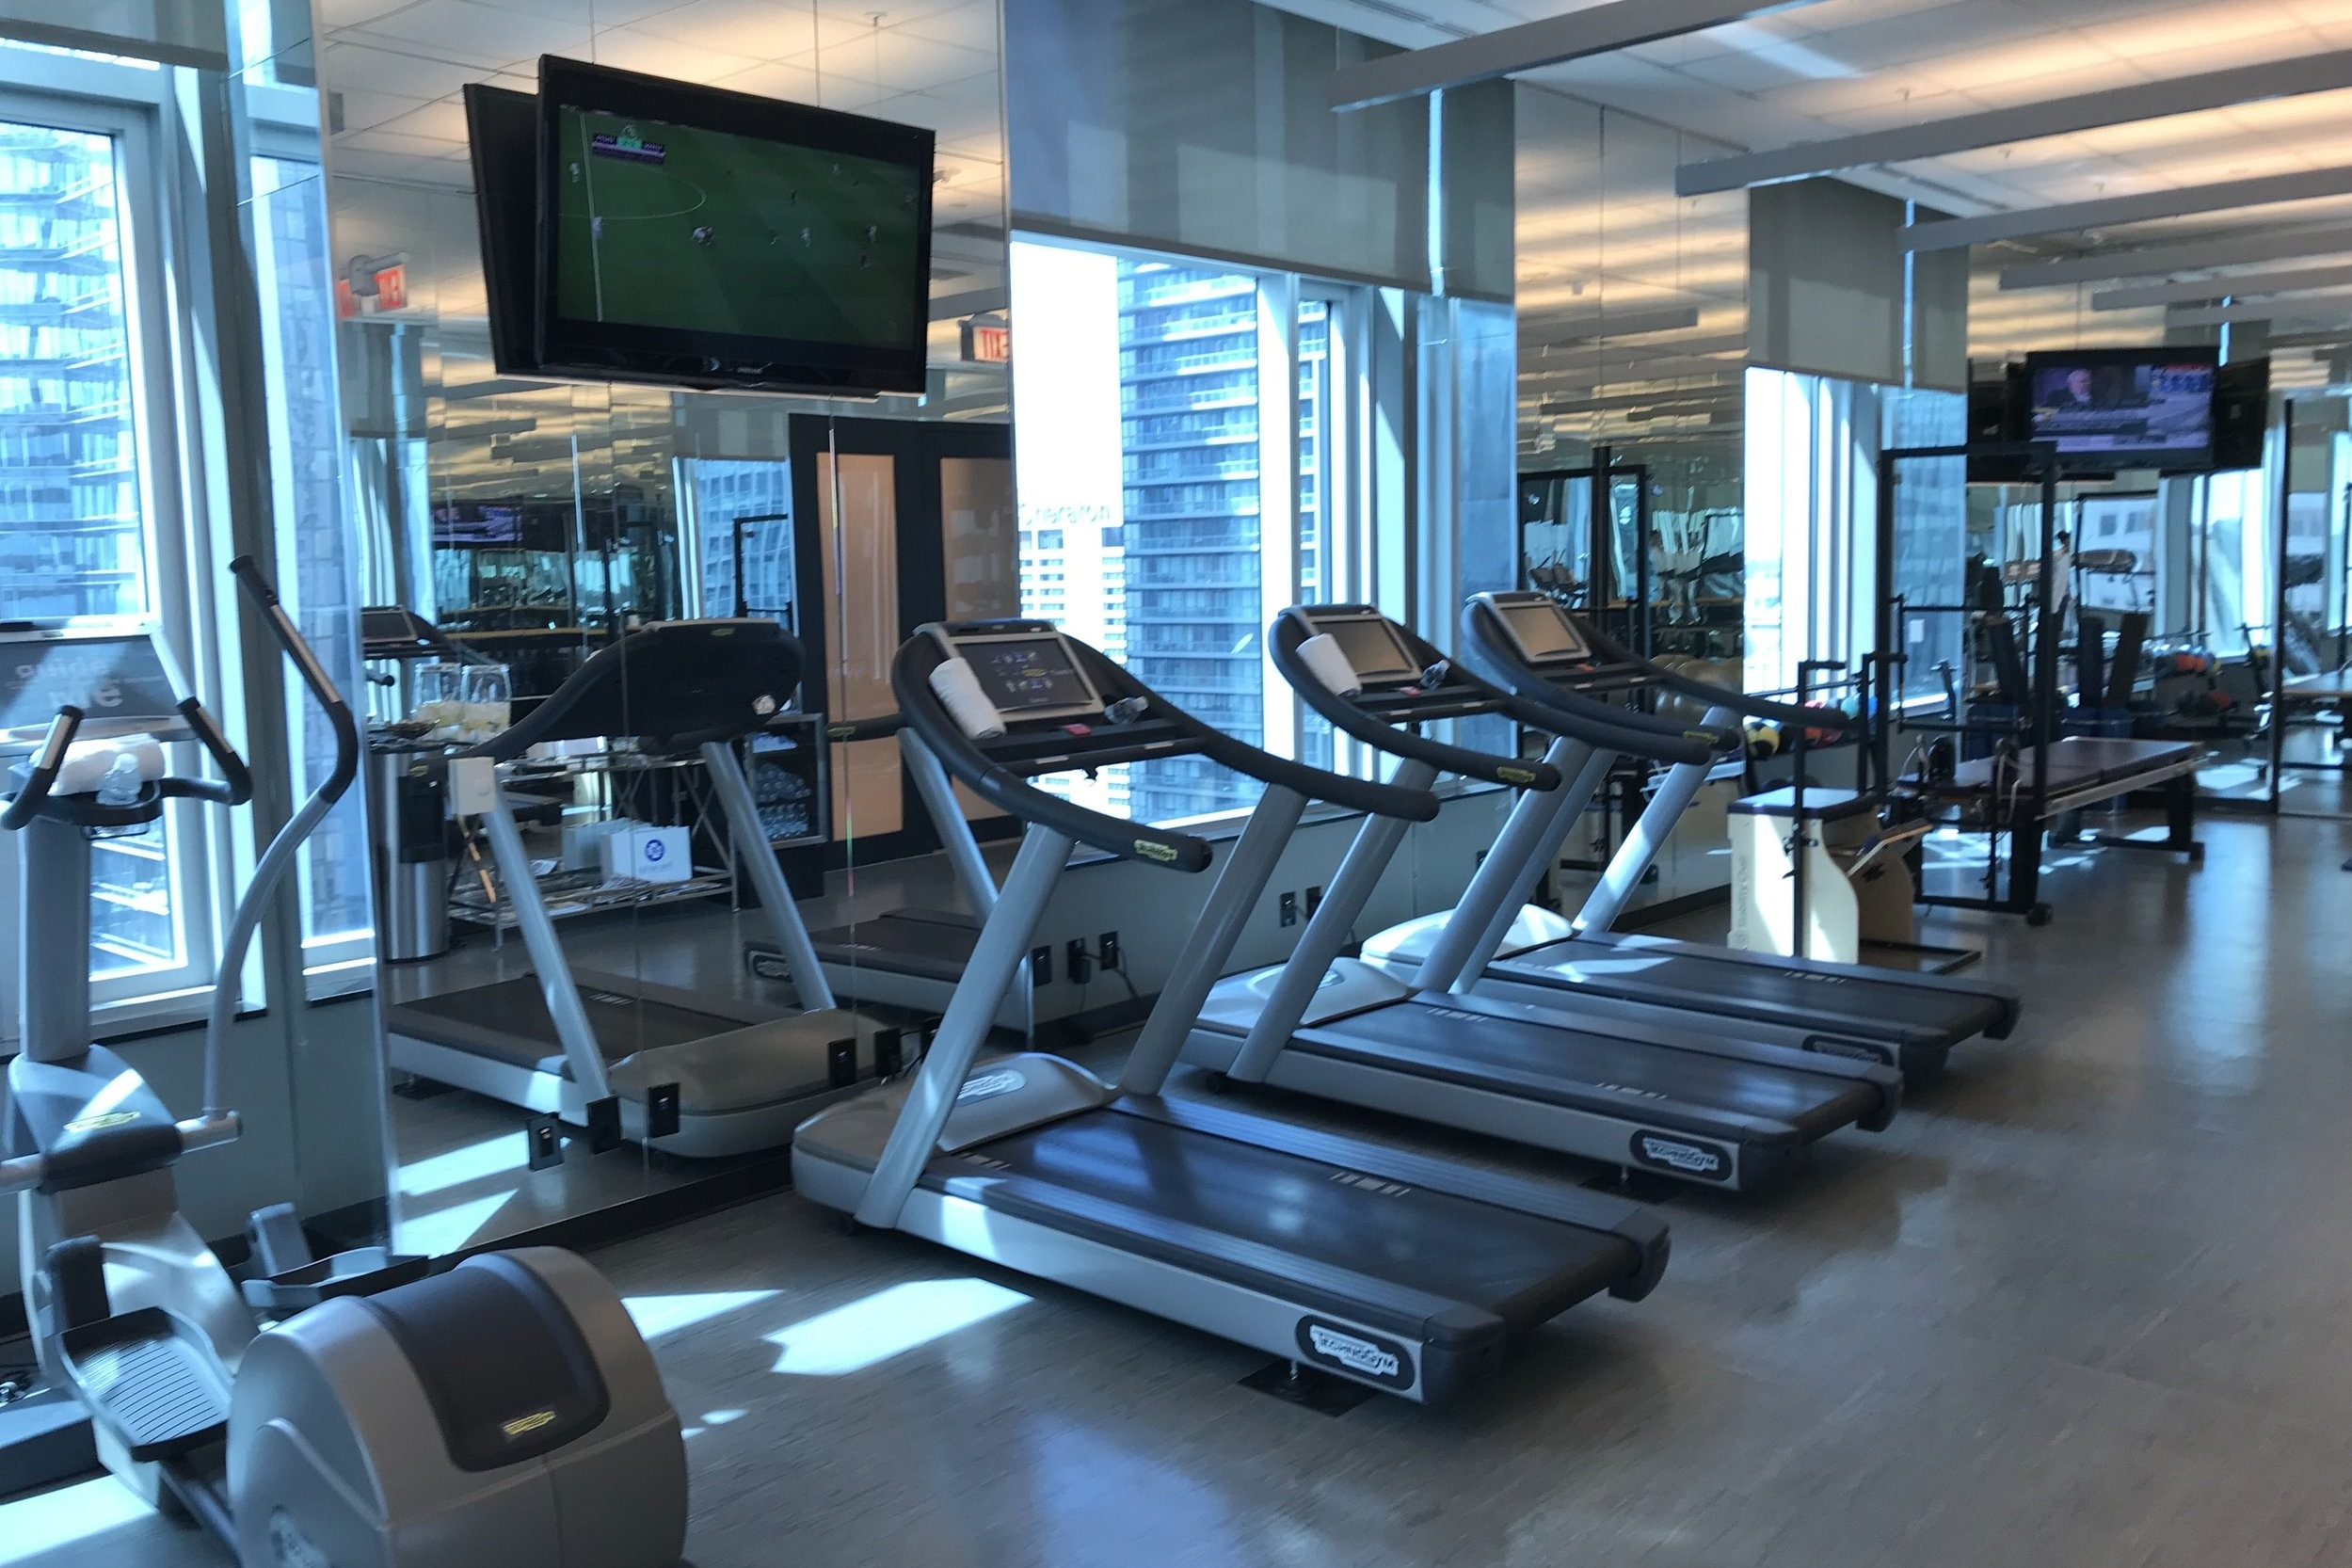 St. Regis Toronto – Fitness studio